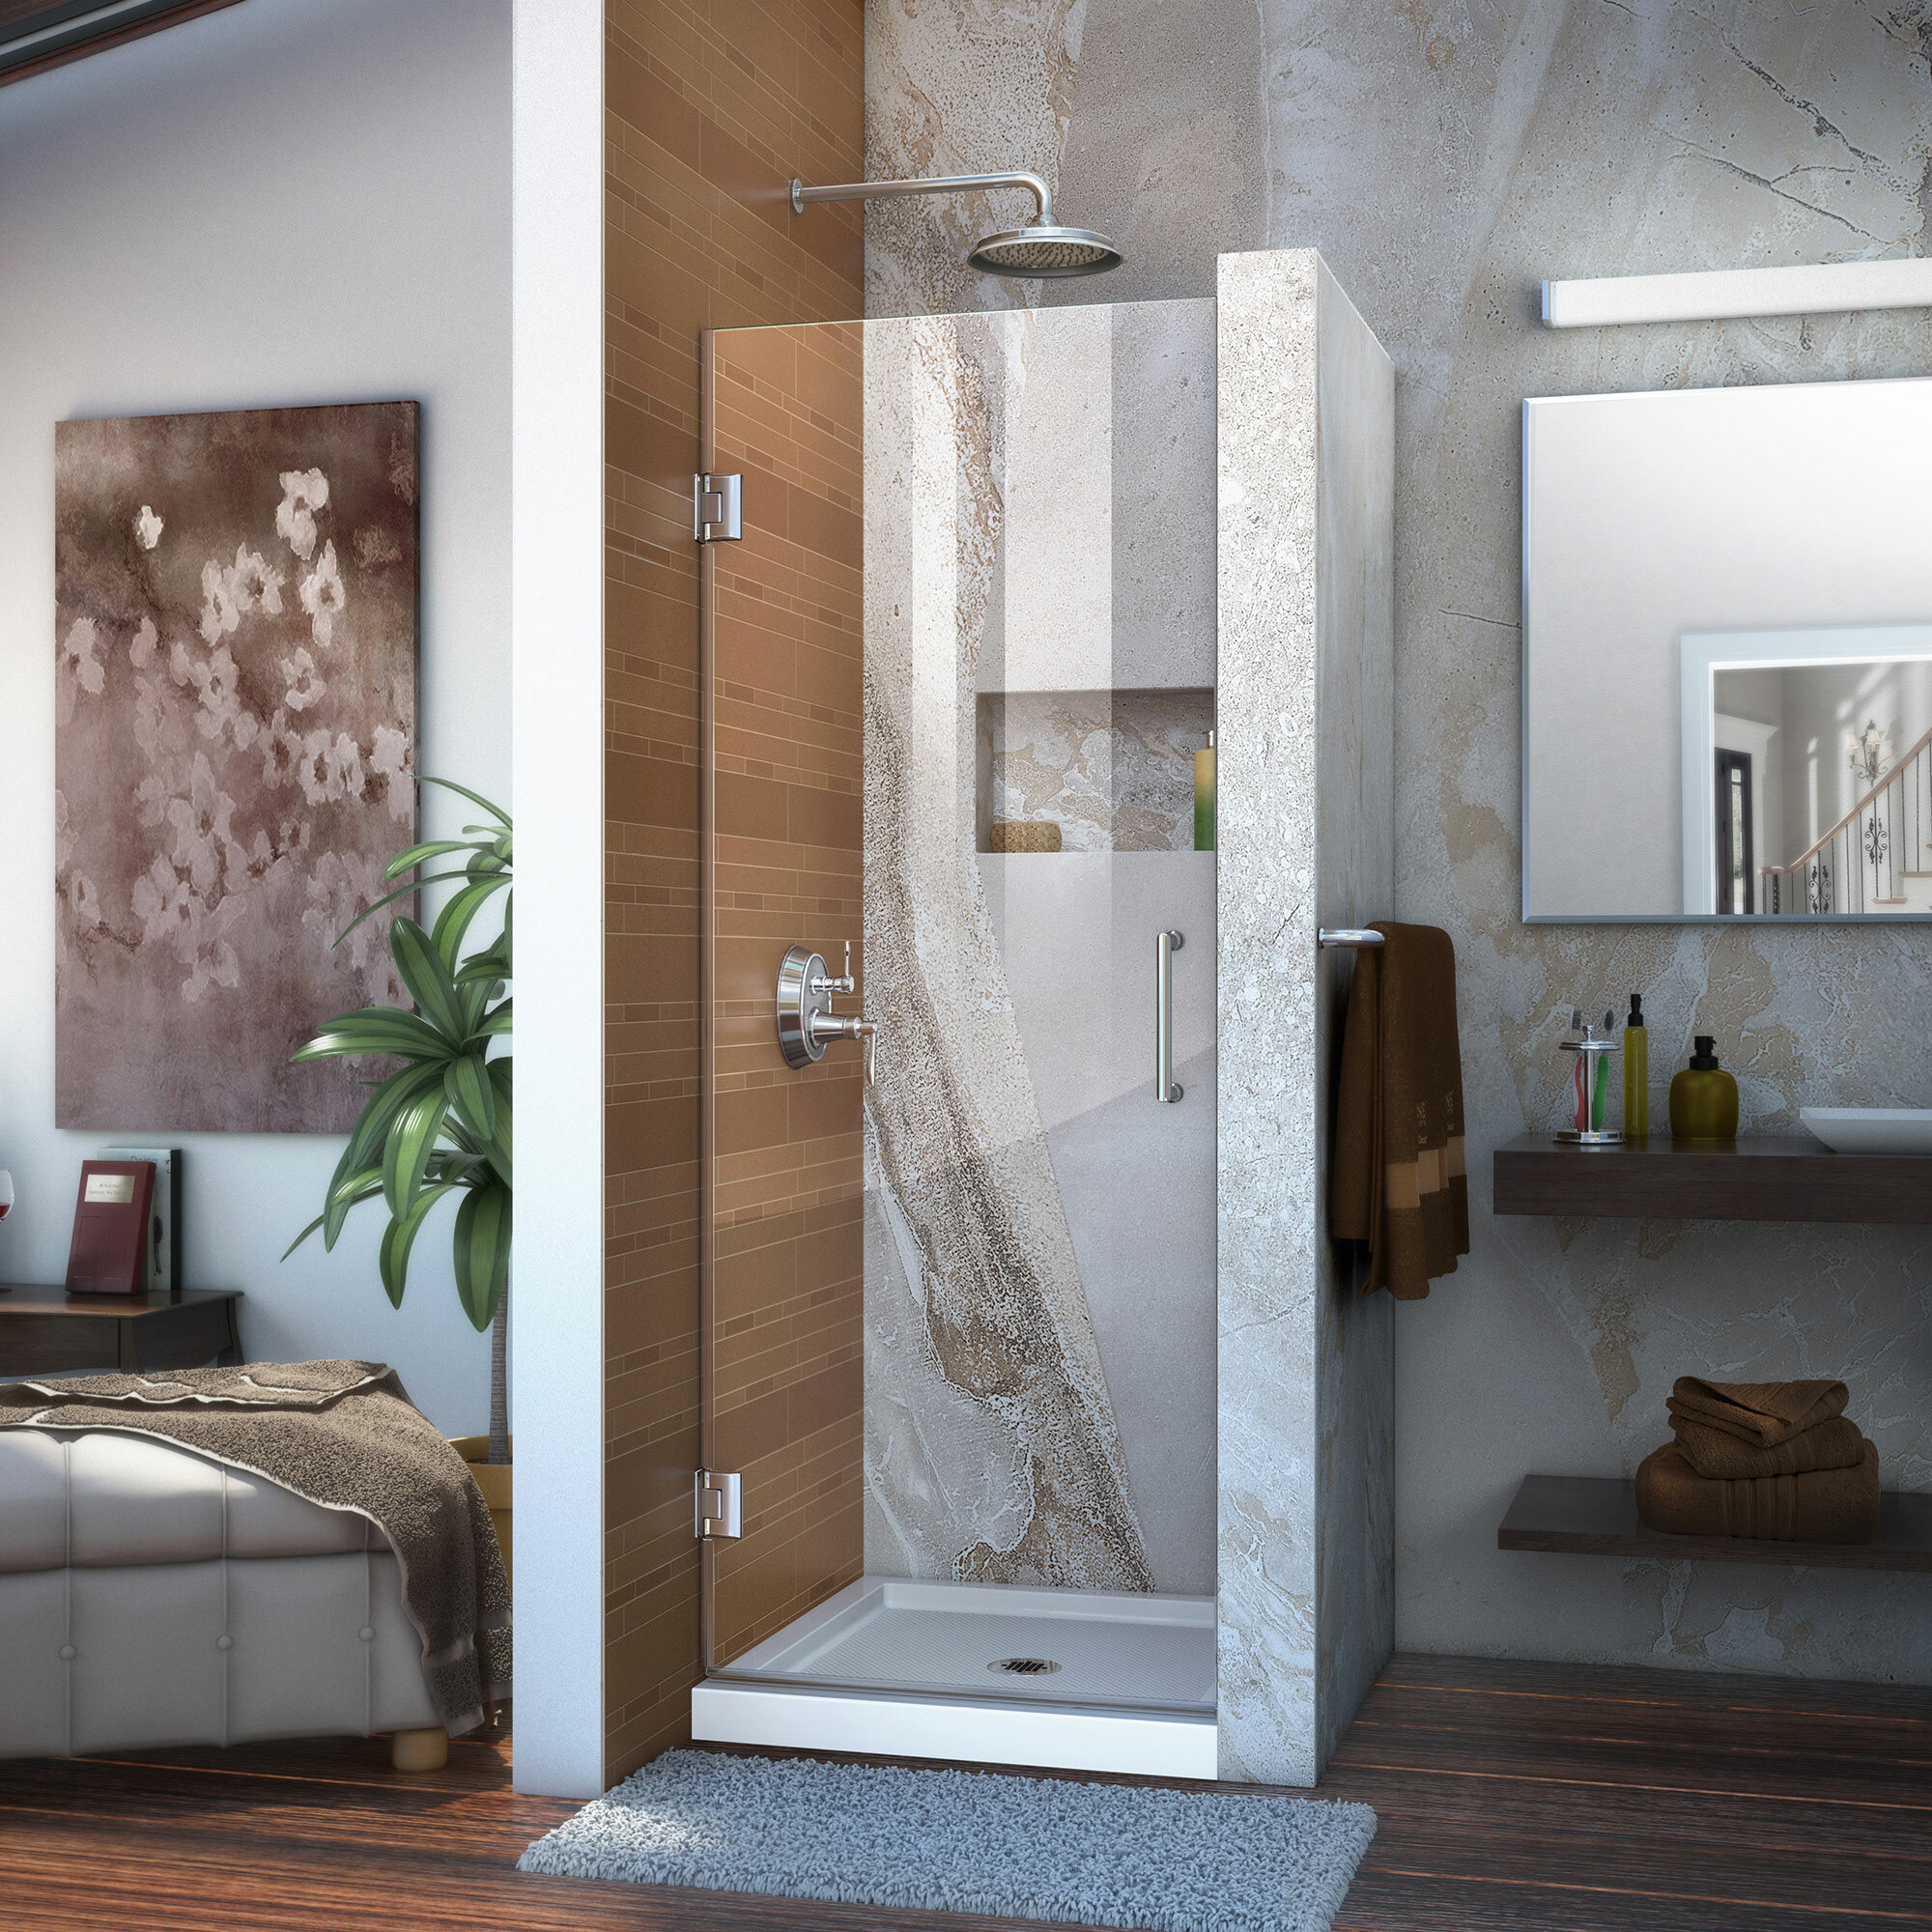 Unidoor 30 X 72 Hinged Frameless Shower Door With Clearmax Technology